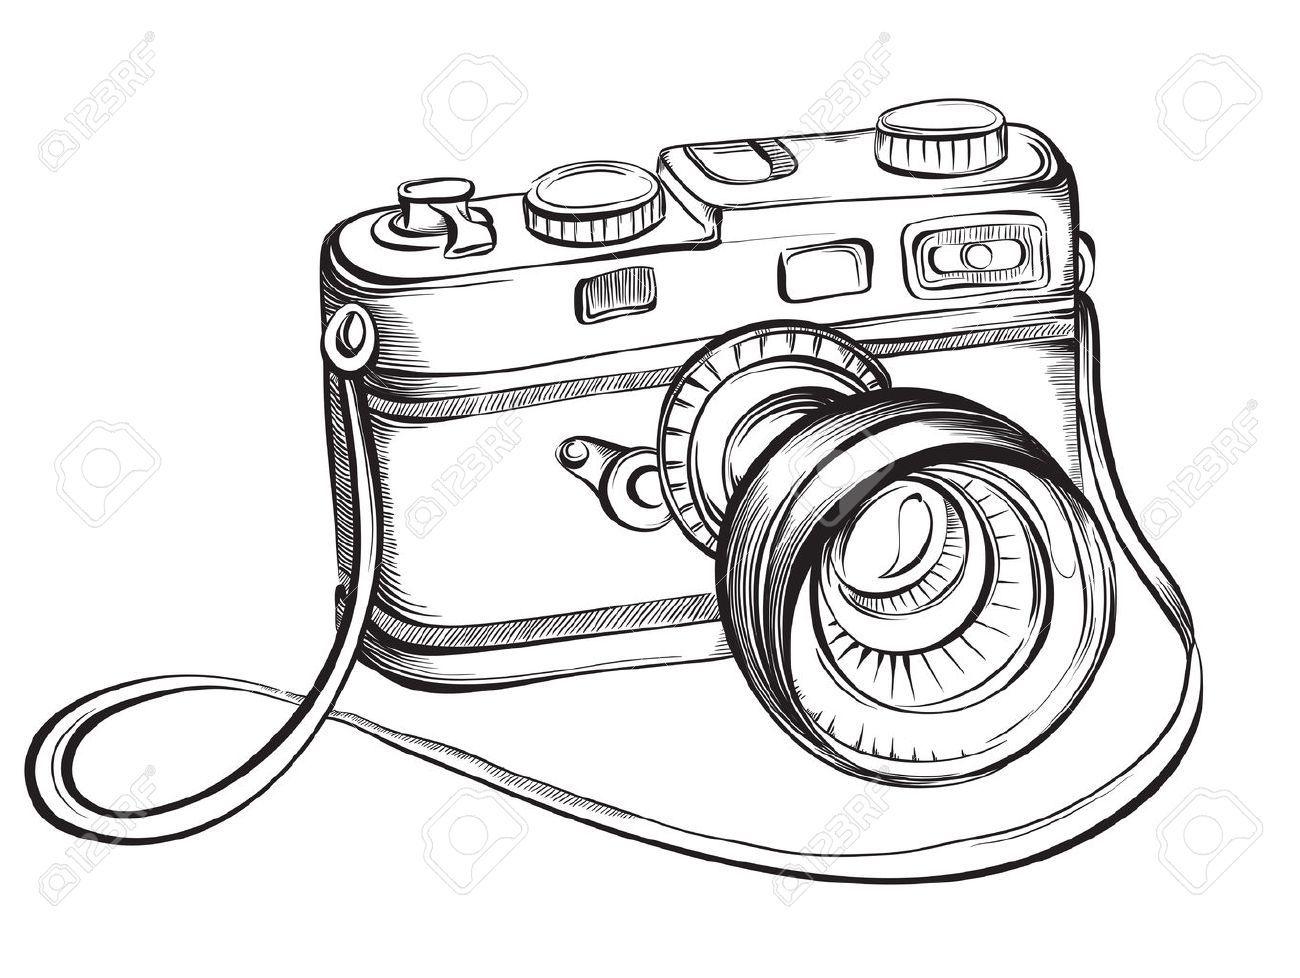 Camera hand drawn. Stock vector interests illustration